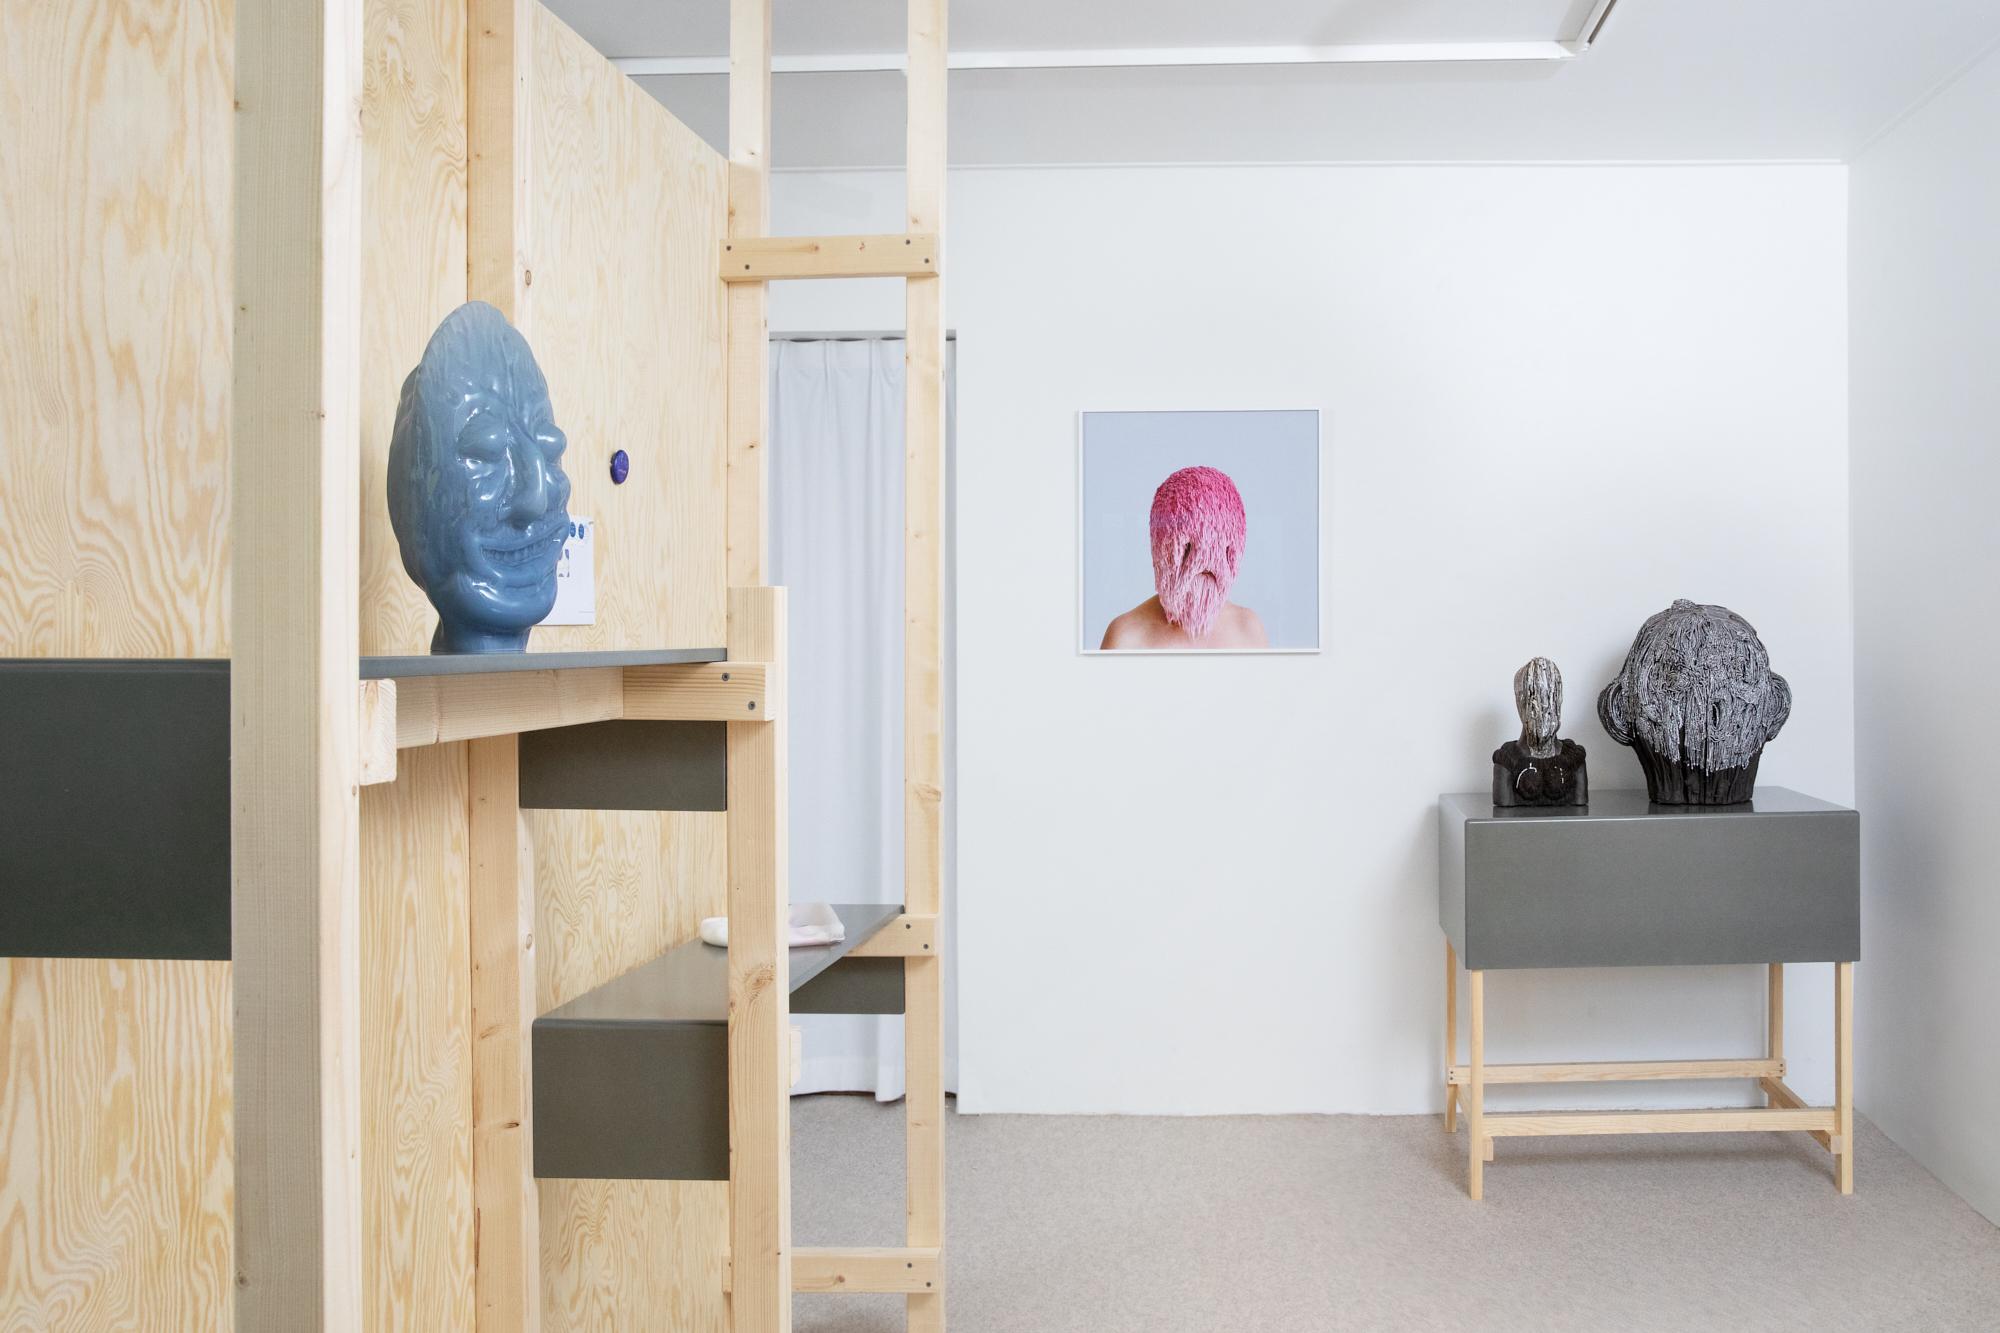 (smiling) faces, Olof Marsja, Greyworm, 2019; threadstories, Falsehoods, 2019; Carl Richard Söderström, Veild Bust, 2015, Troubled face, 2020, foto. Foto Sanna Lindberg, glas, steengoed, glazuur, tentoonstelling